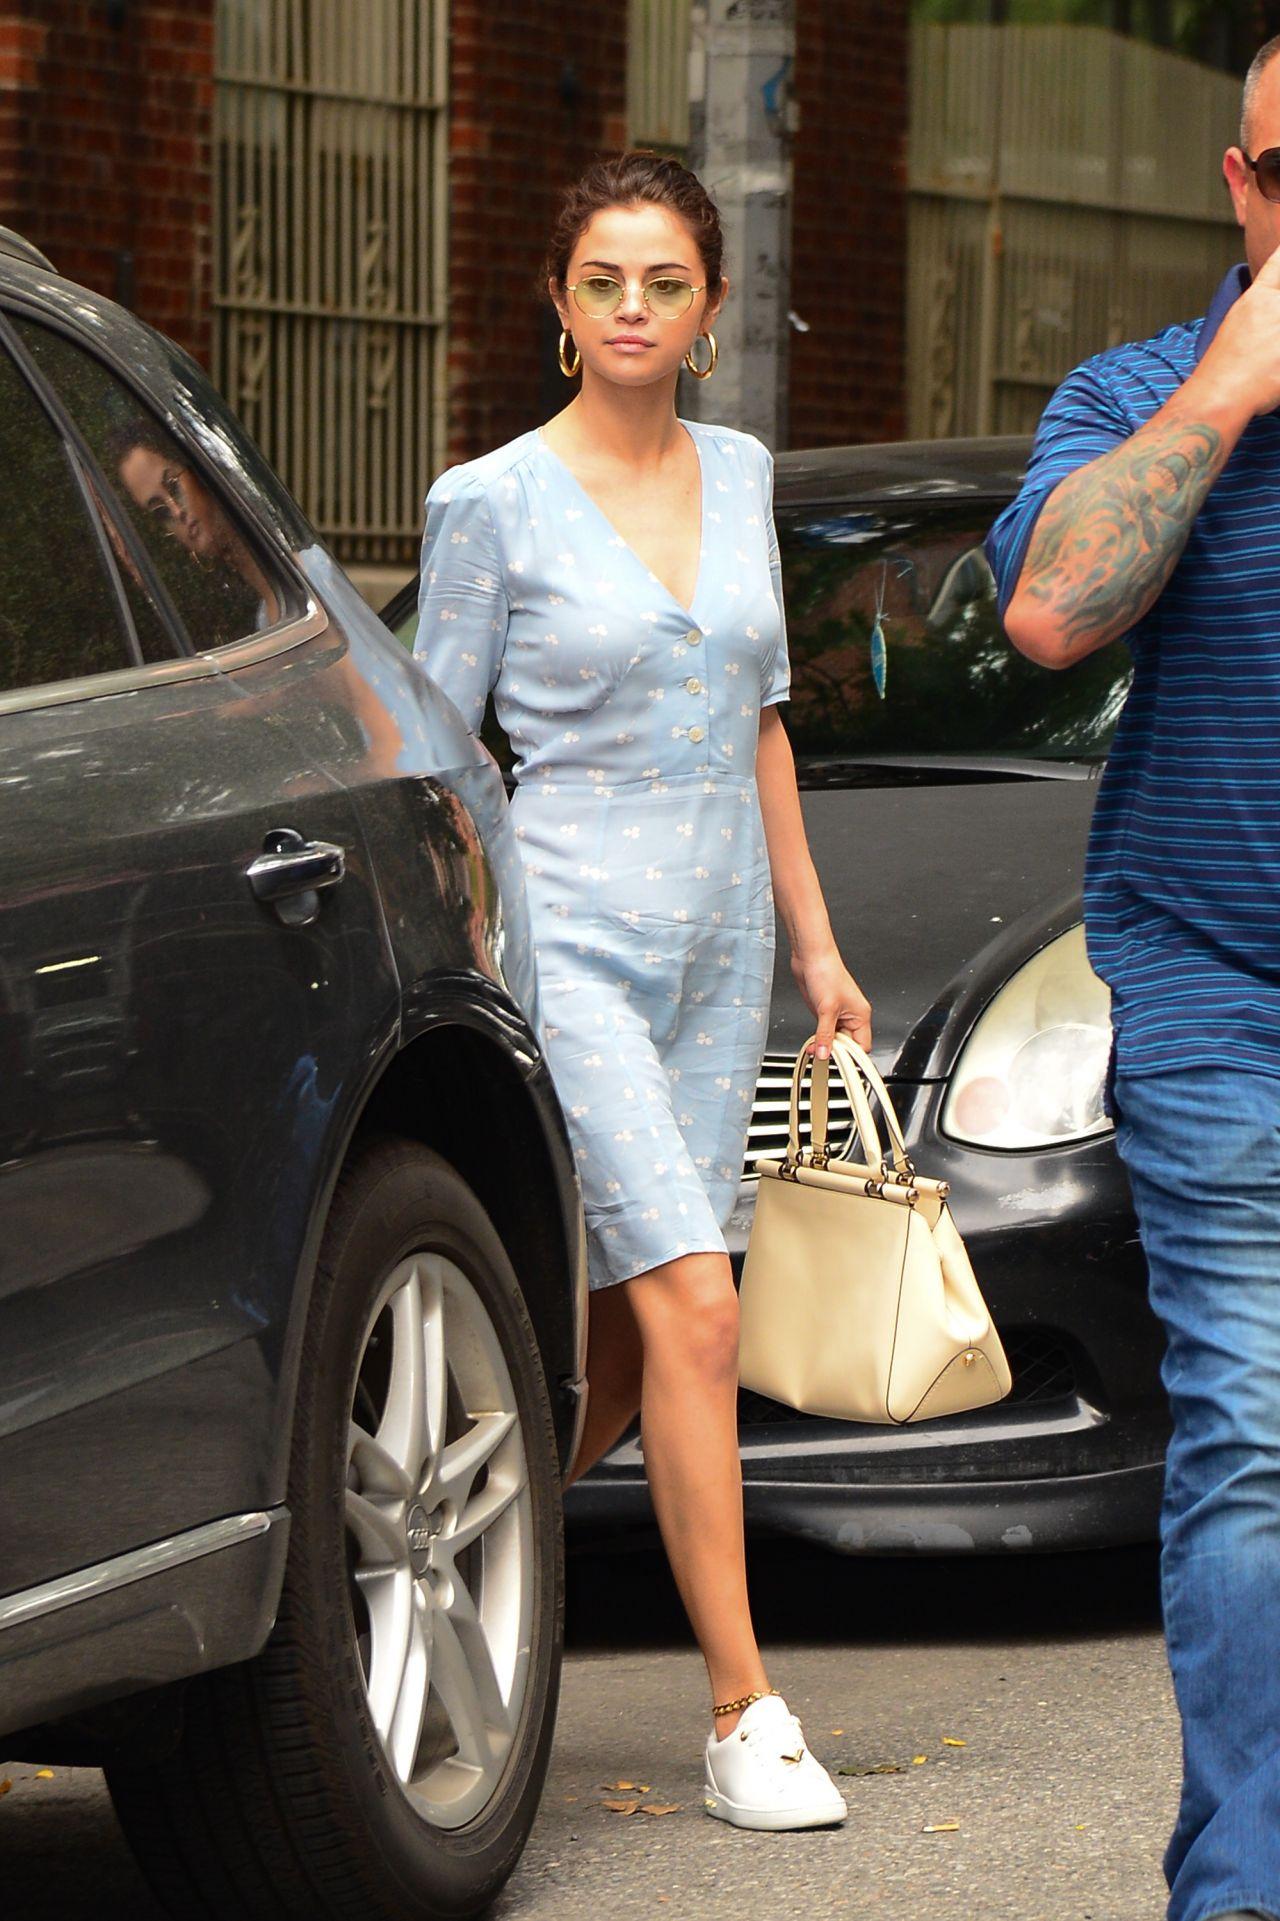 Selena Gomez Wearing A Blue Dress In Nyc 09 15 2017